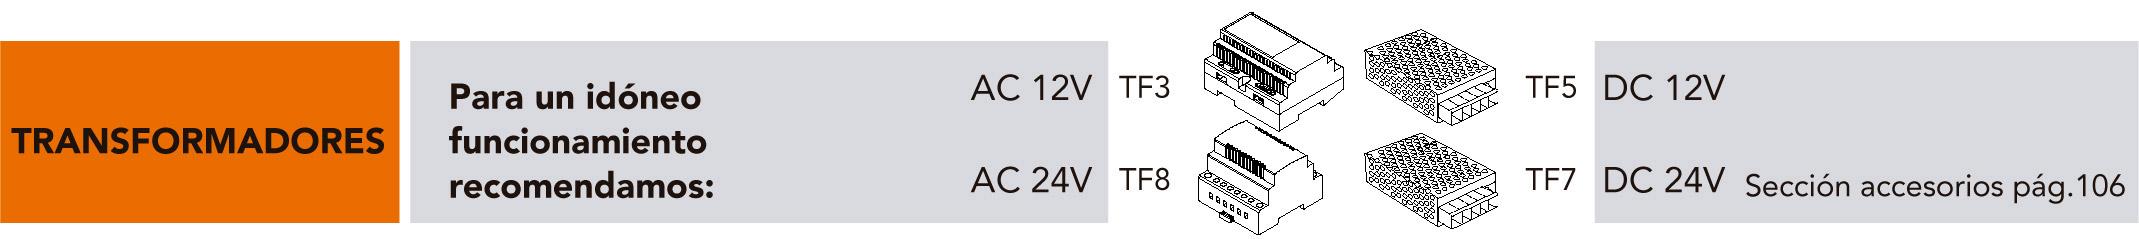 S45-44_transformadores